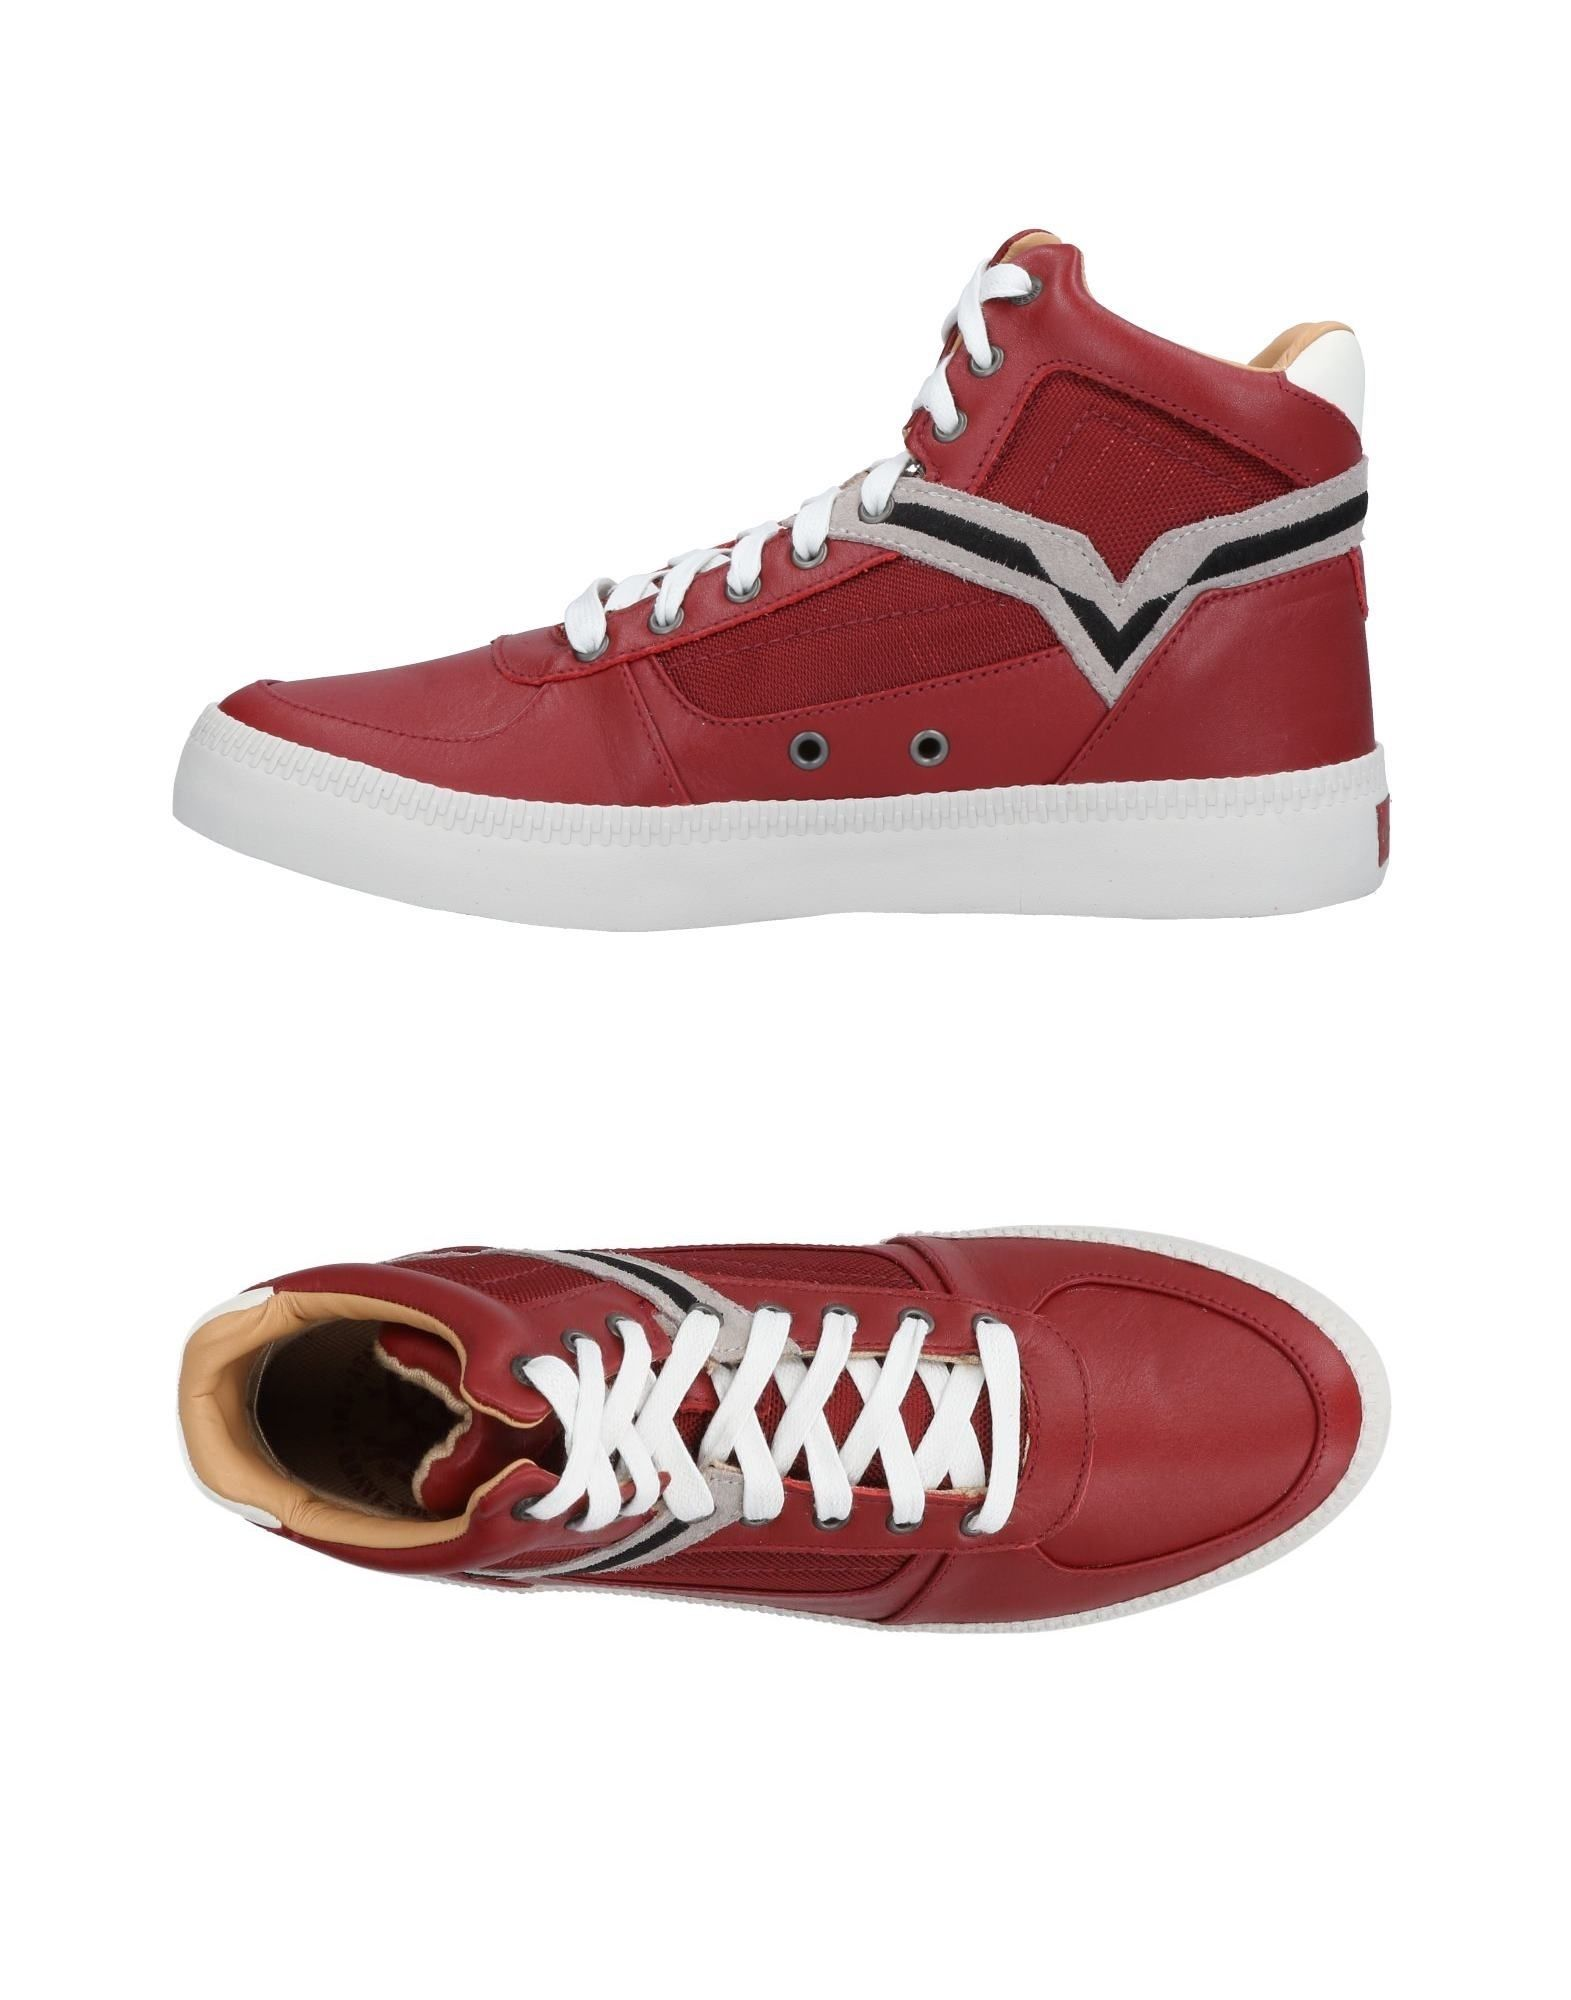 Rabatt echte Schuhe 11491049HS Diesel Sneakers Herren  11491049HS Schuhe d1f8bc